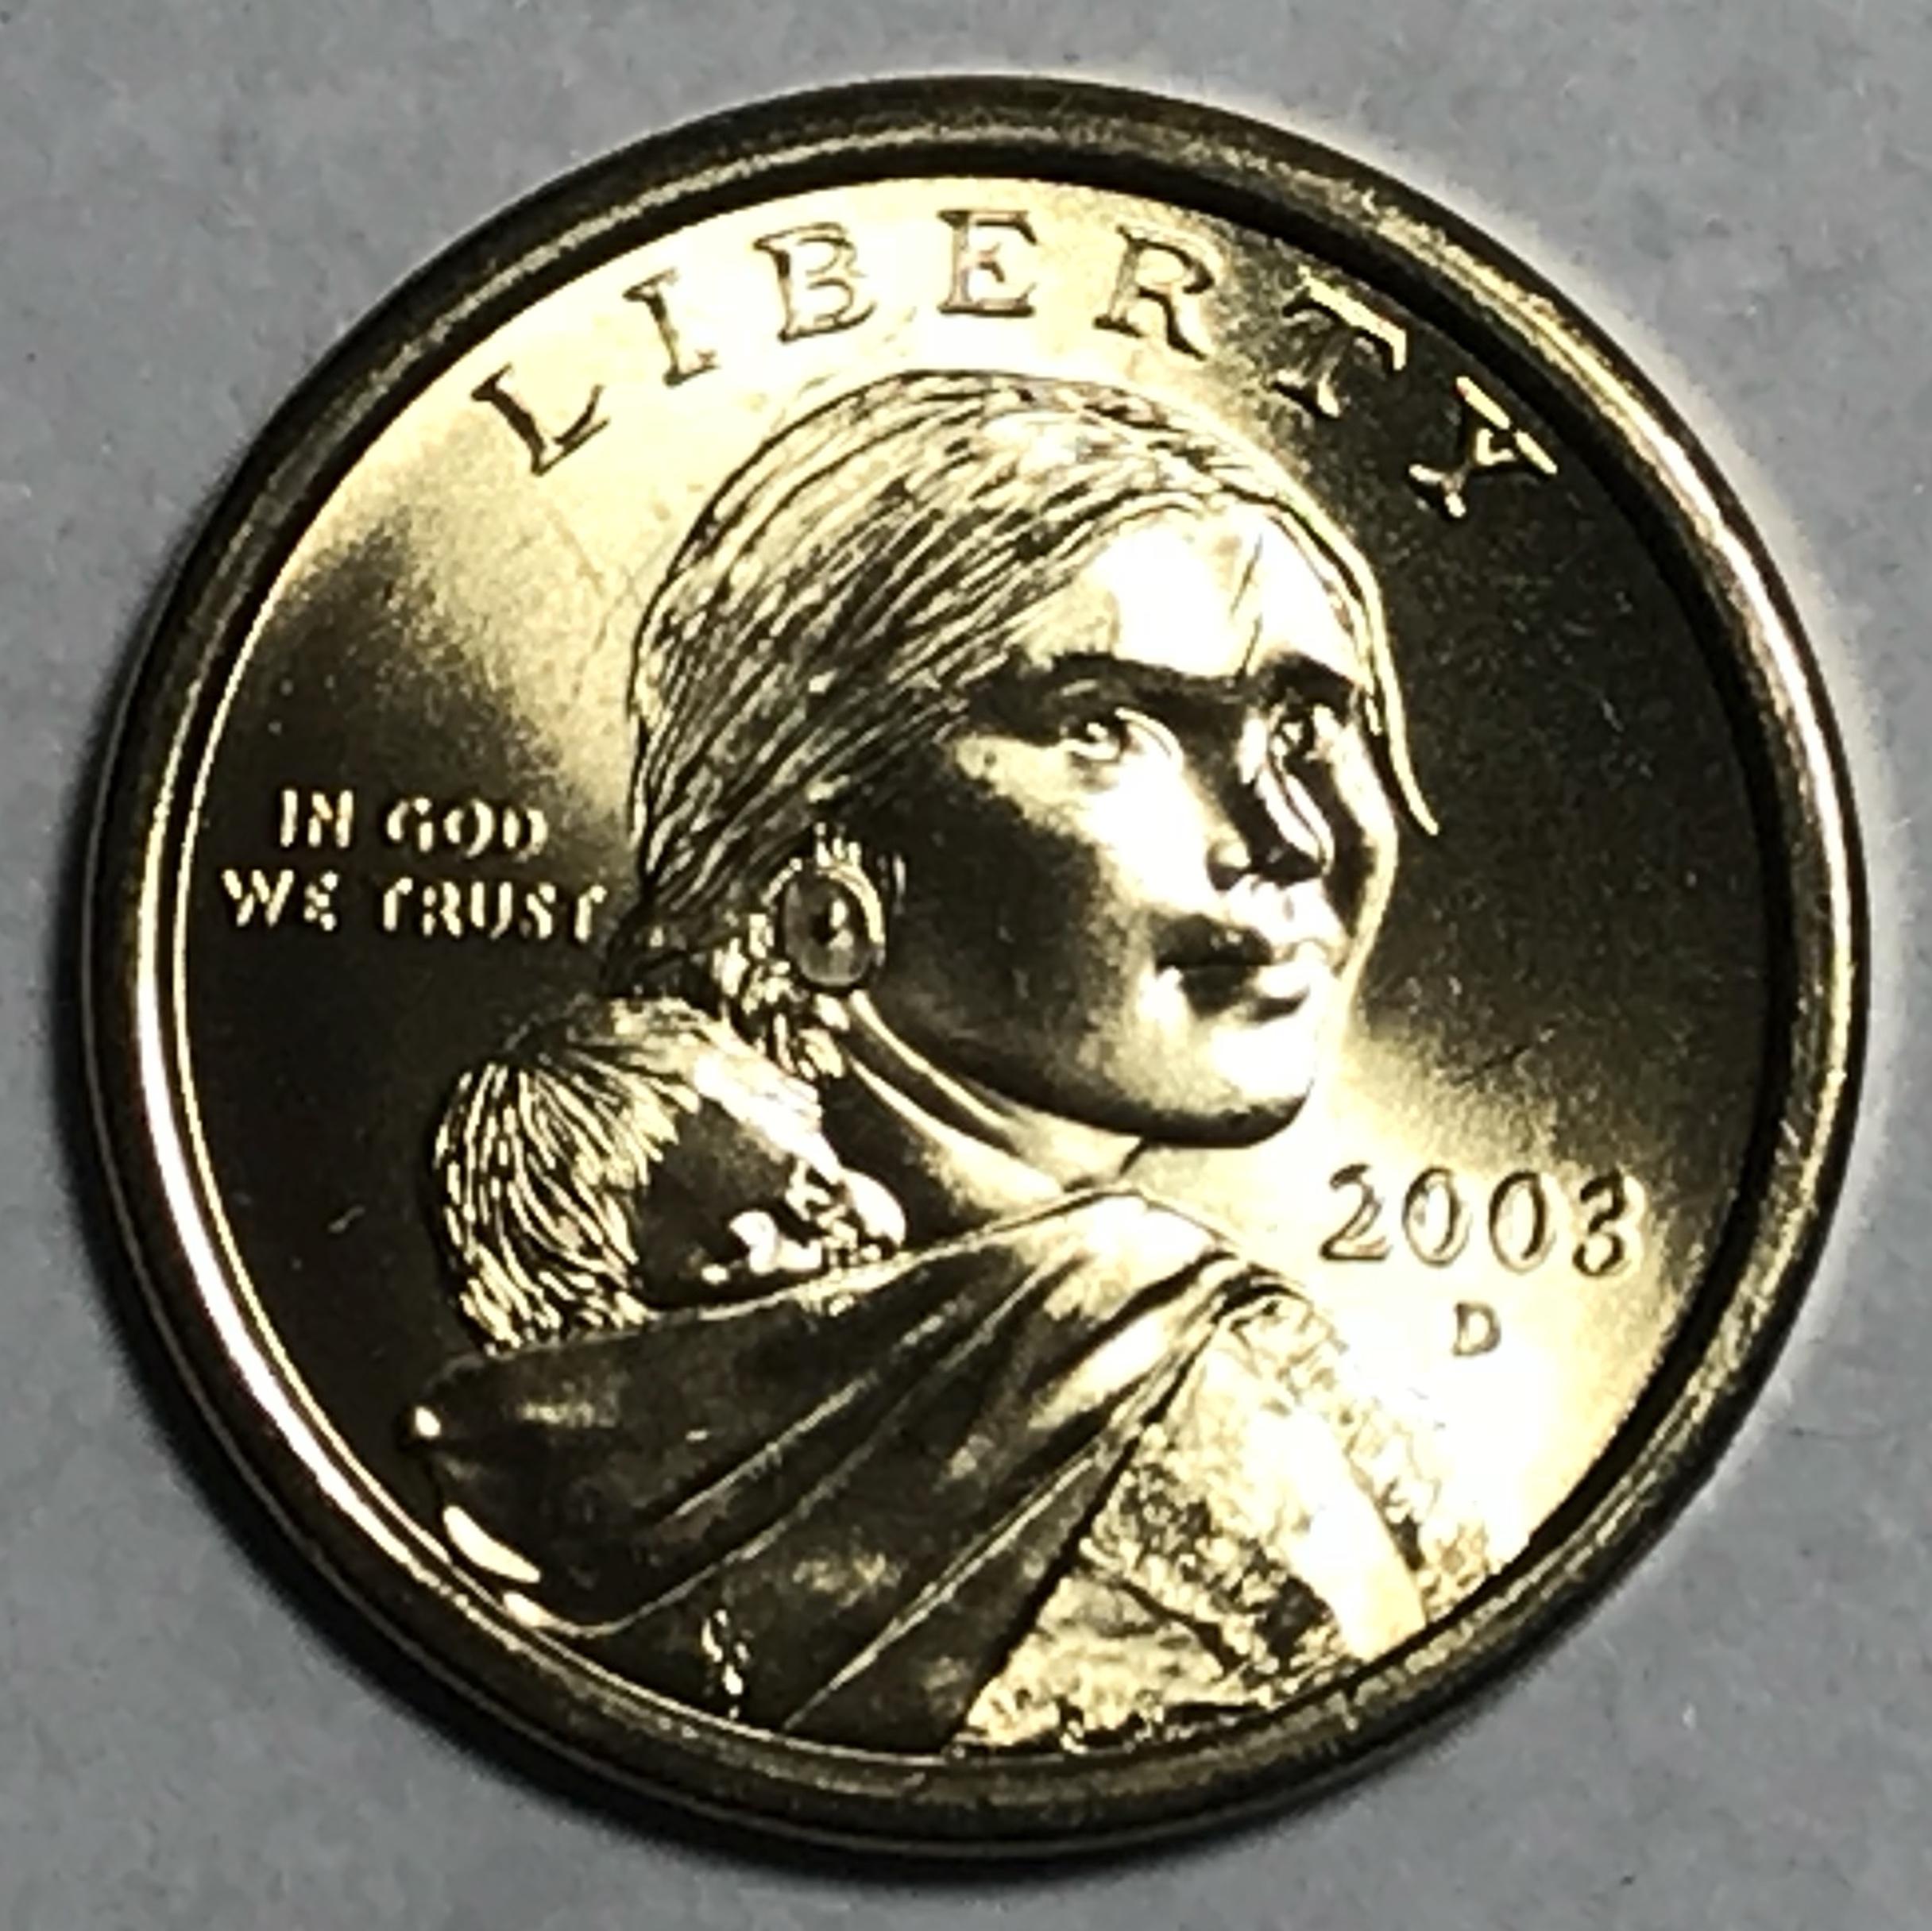 1995 P $1 XXVI Olympiad Track /& Field Commemorative Silver Dollar NGC PF69 UC